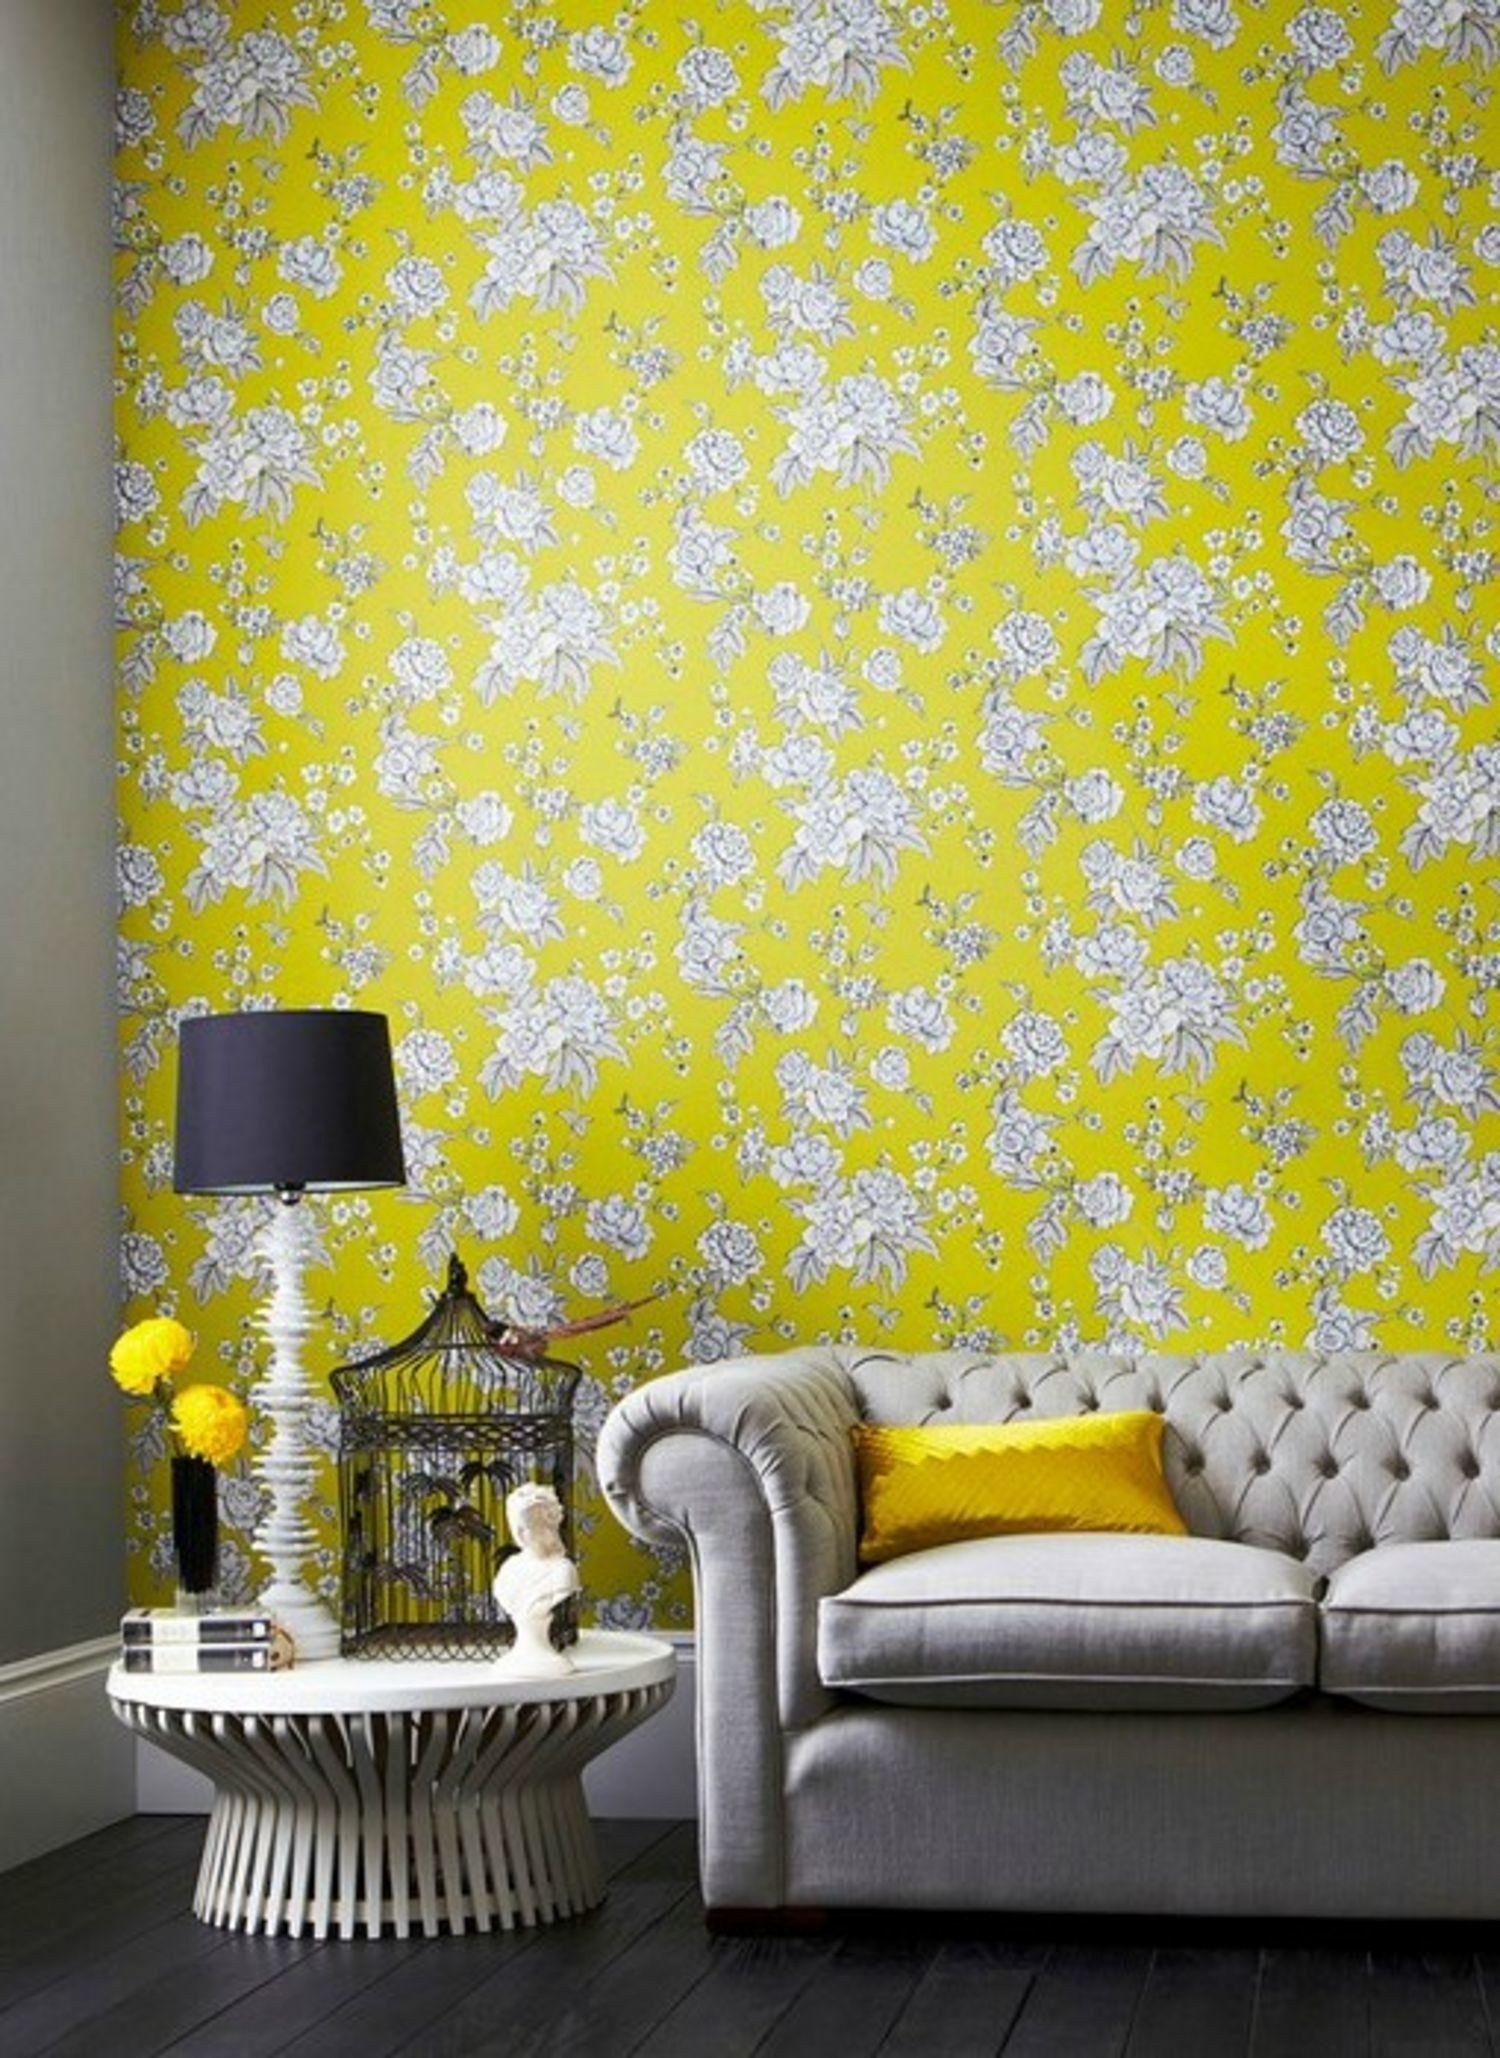 Image result for temporary wallpaper | MATERIAL: Wallpaper ...